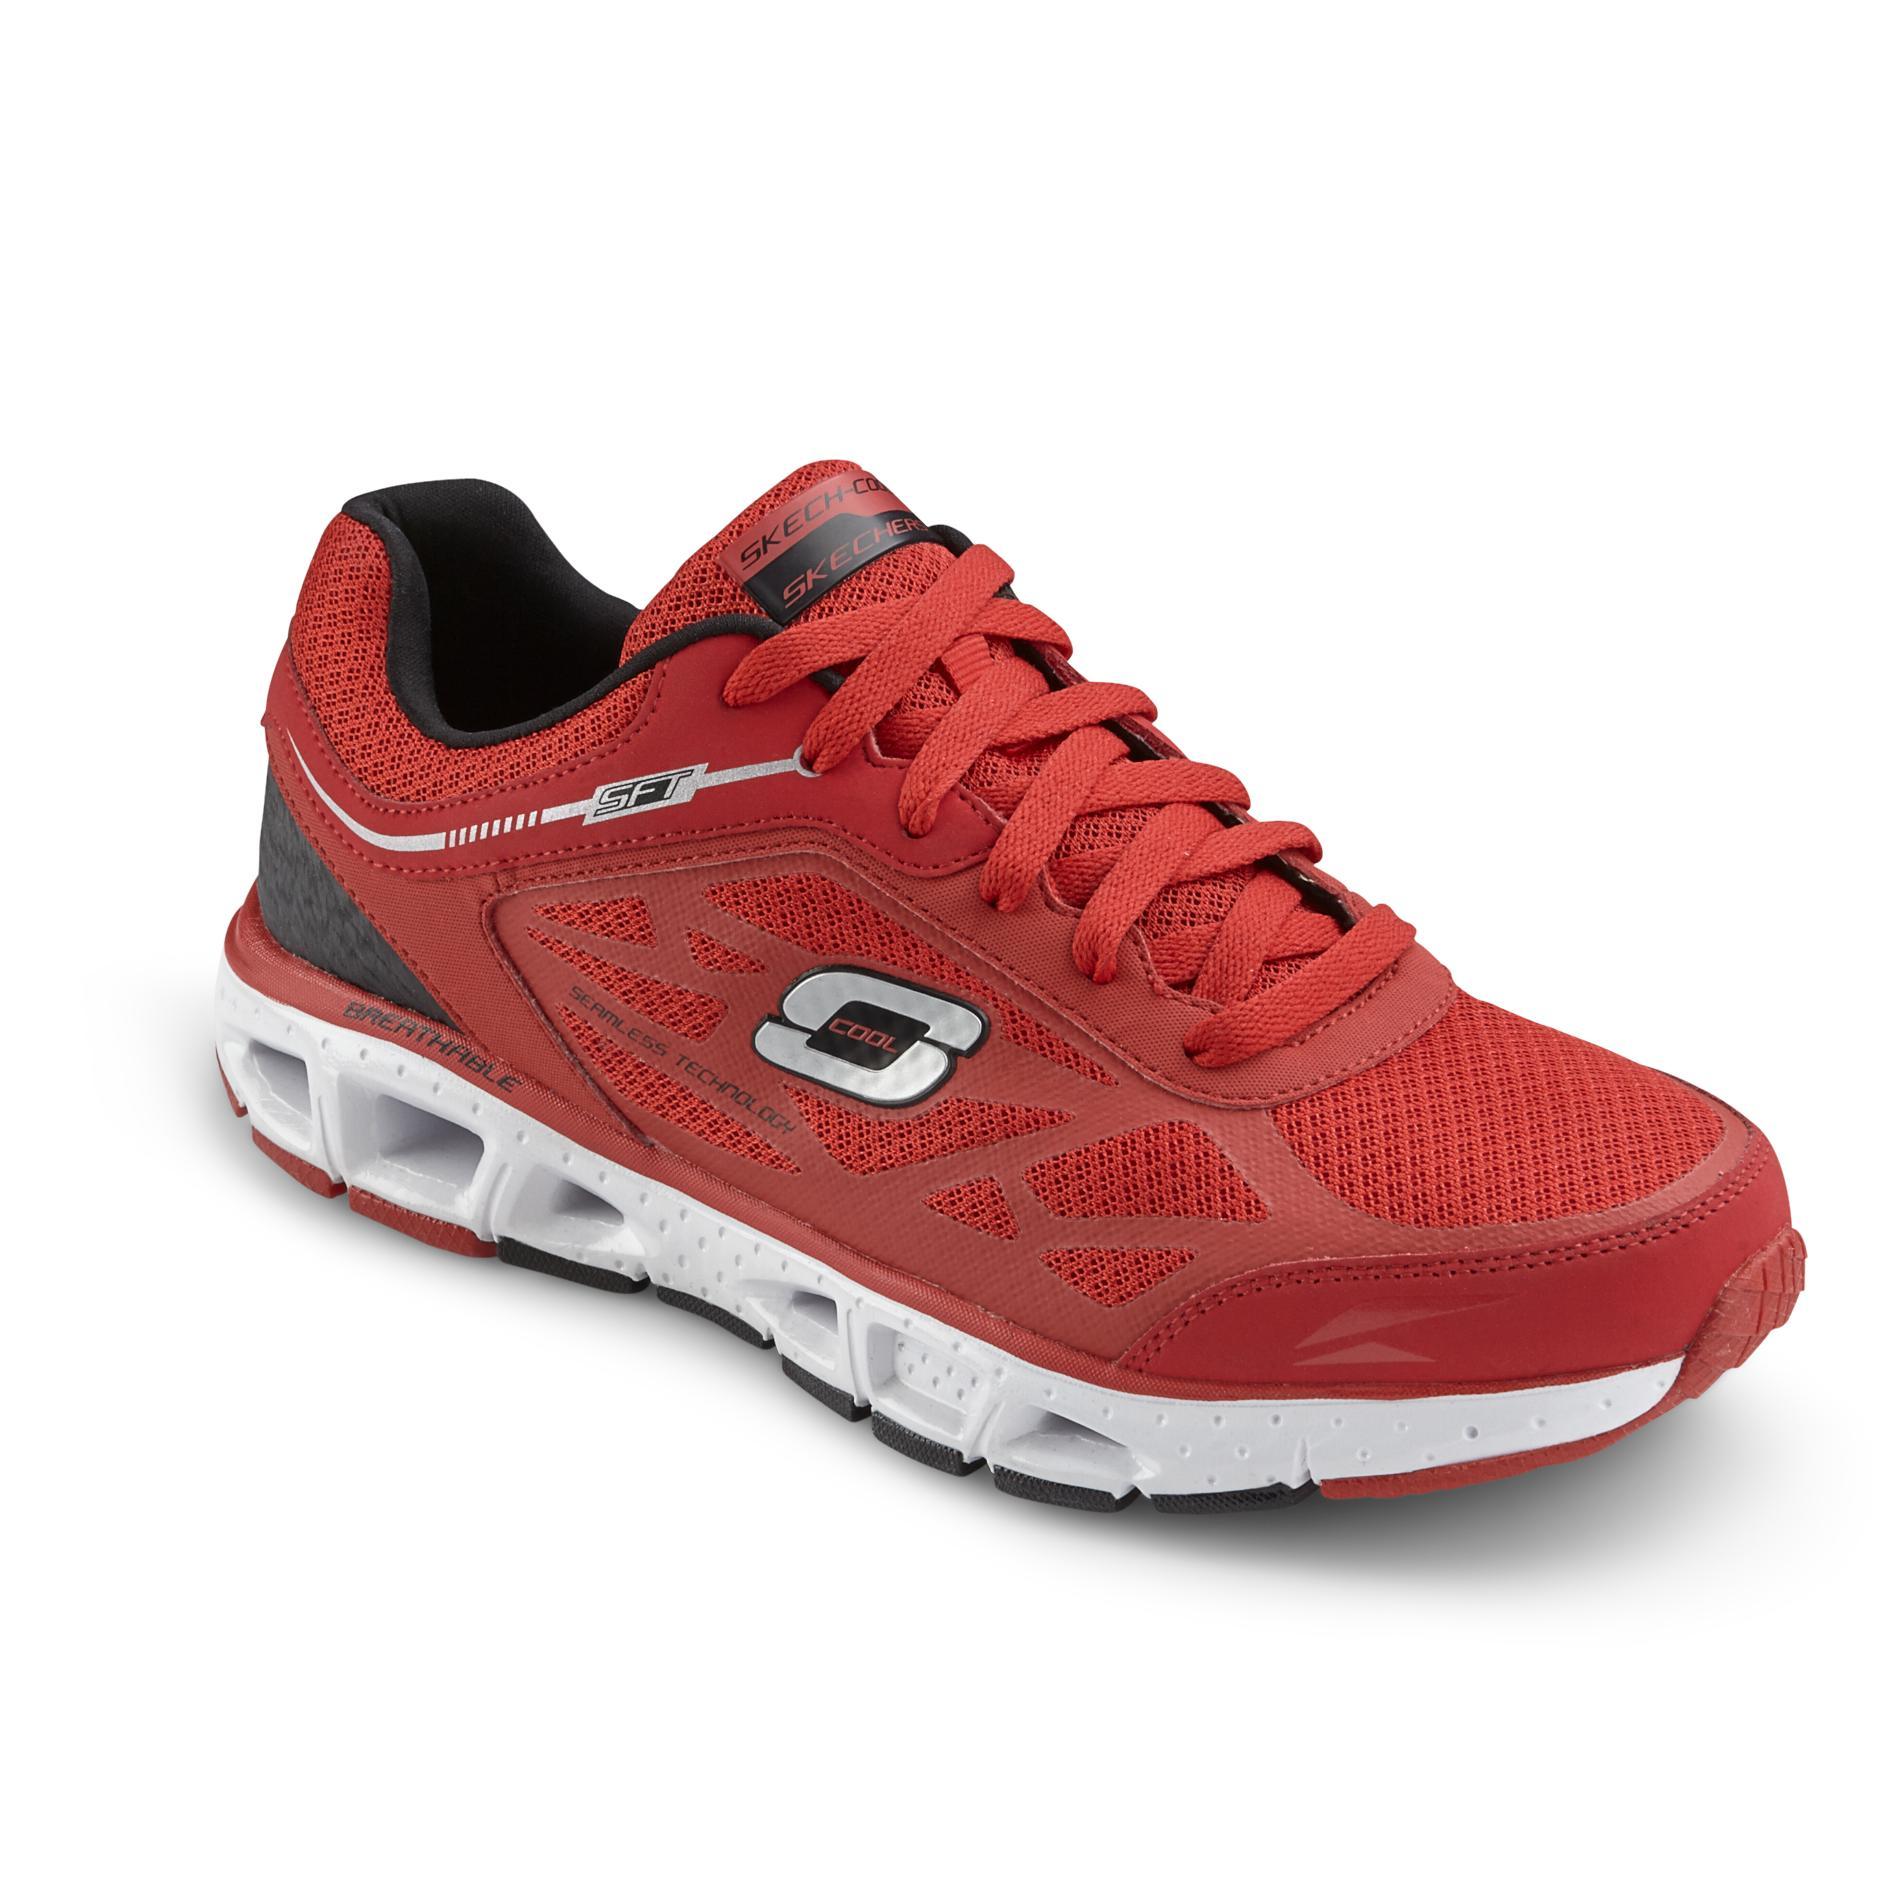 Men's Skech-Cool Red/Black Memory Foam Athletic Shoe